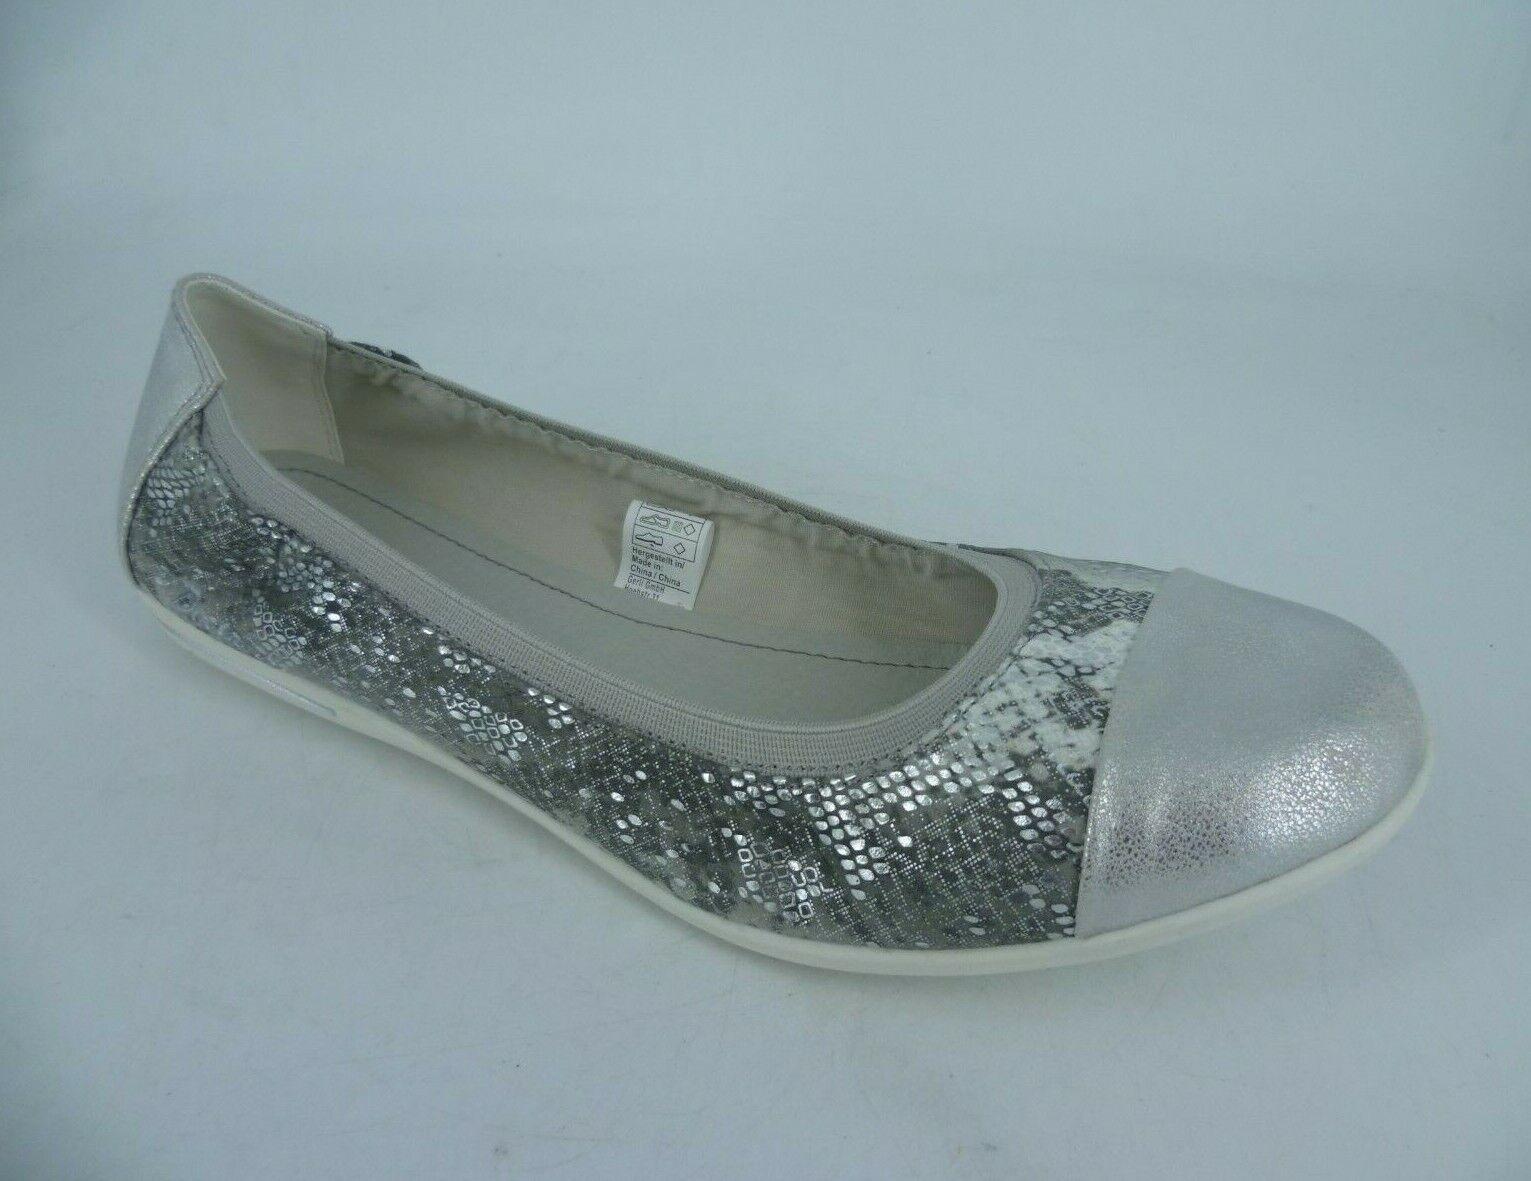 Dockers By Gerli Ladies Ballet Pumps Silver UK 8 EU 42 LN46 25